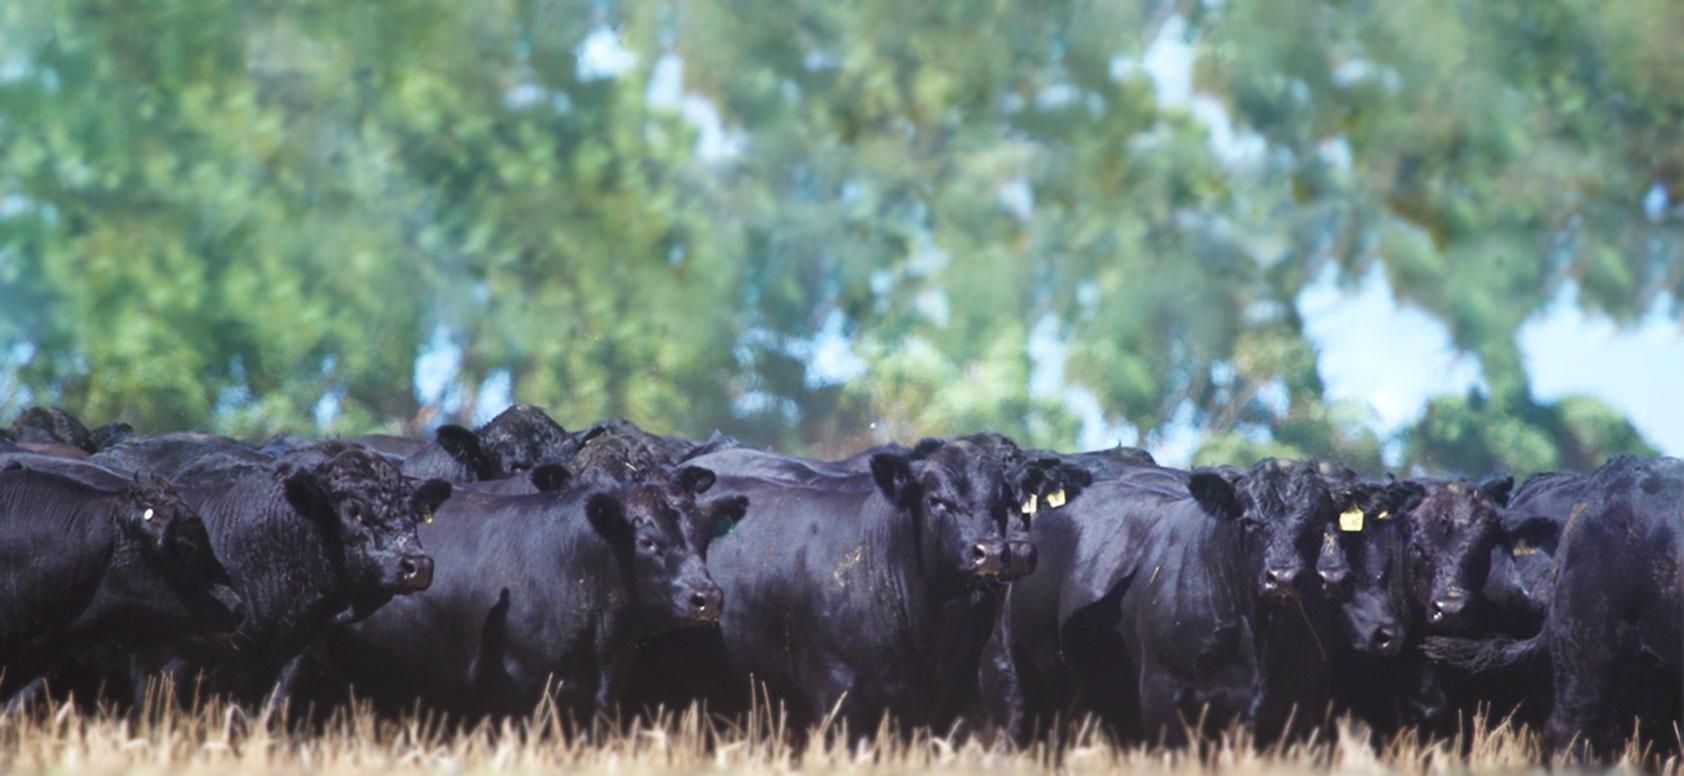 black-bulls-new-edit-1684-2